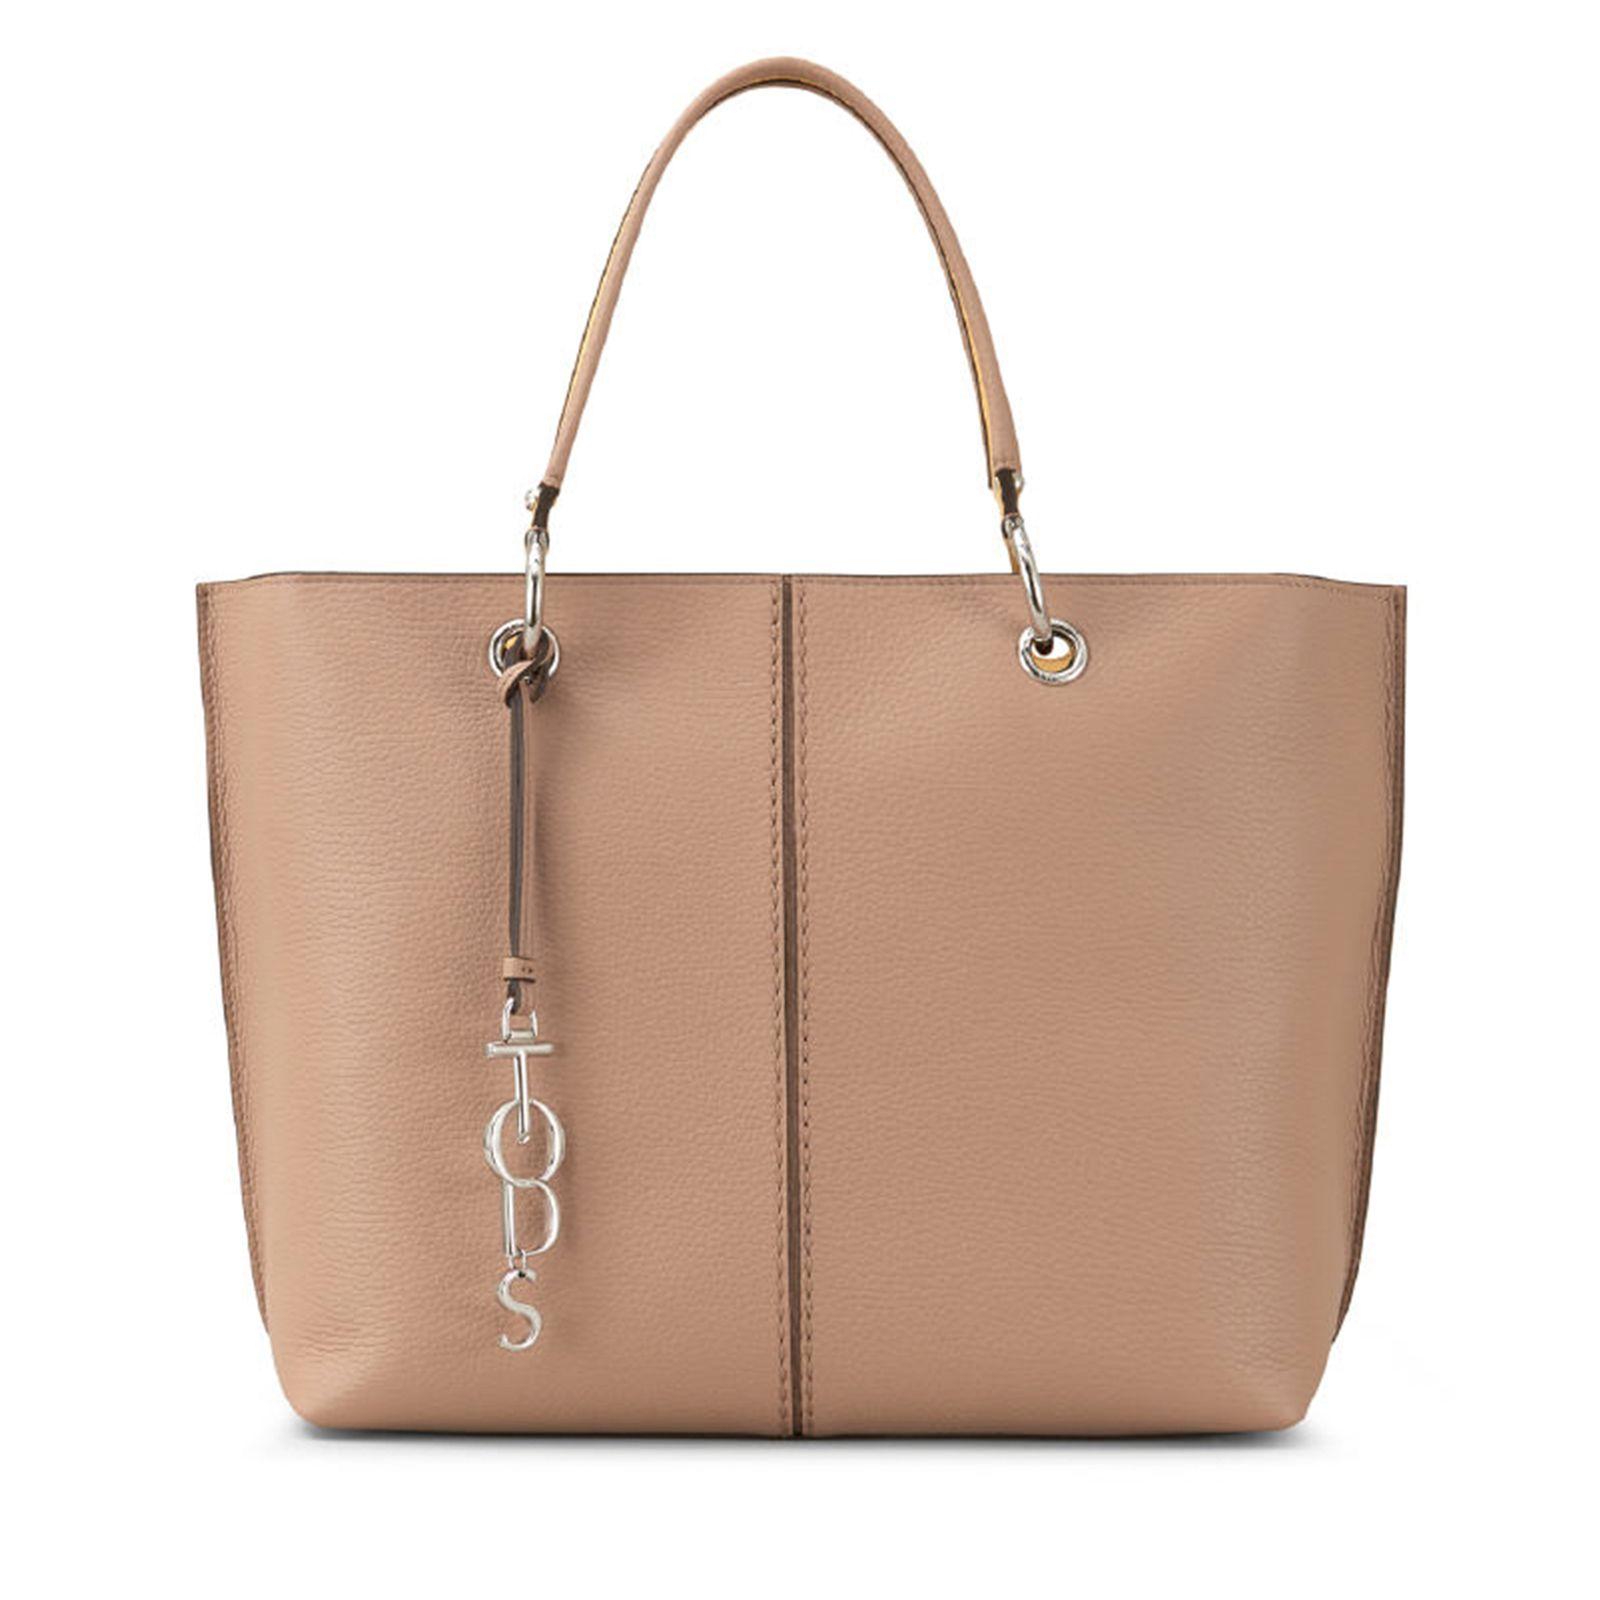 a9a720b7361b7 Torebka joy bag medium TOD'S – Kup Teraz! Najlepsze ceny i opinie! Sklep  Moliera2.com